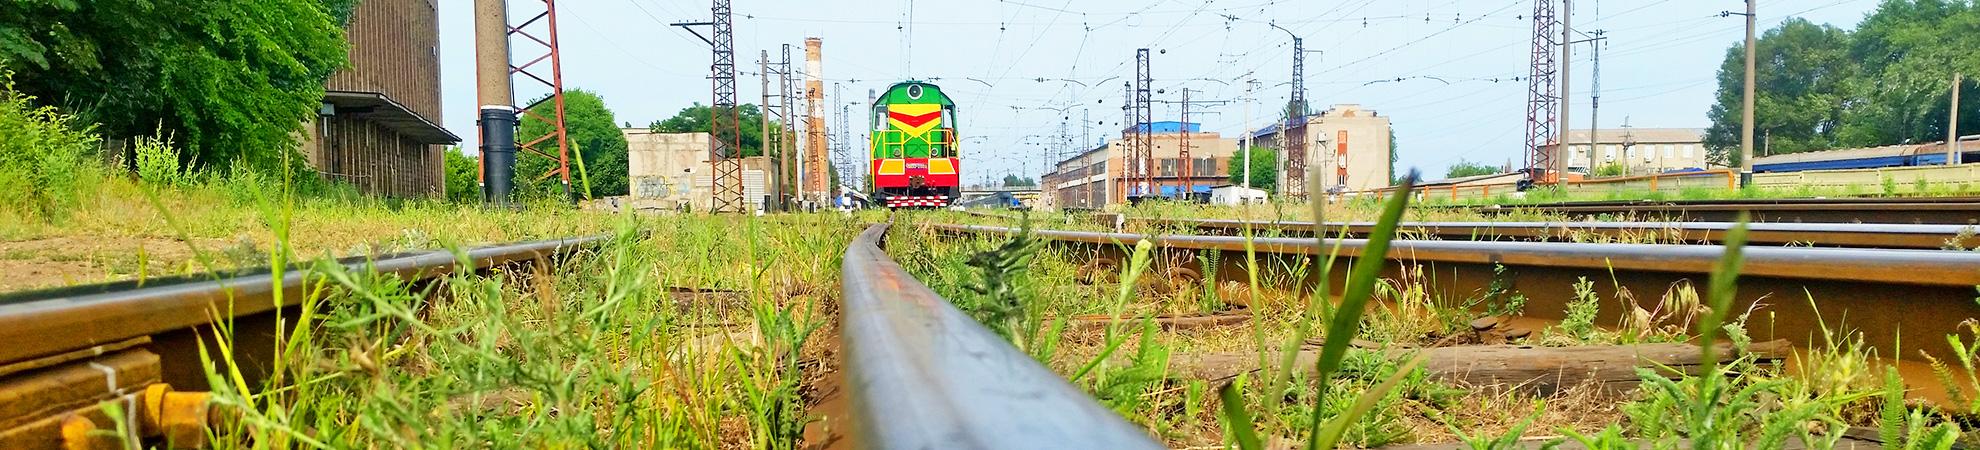 Aller en Inde en train